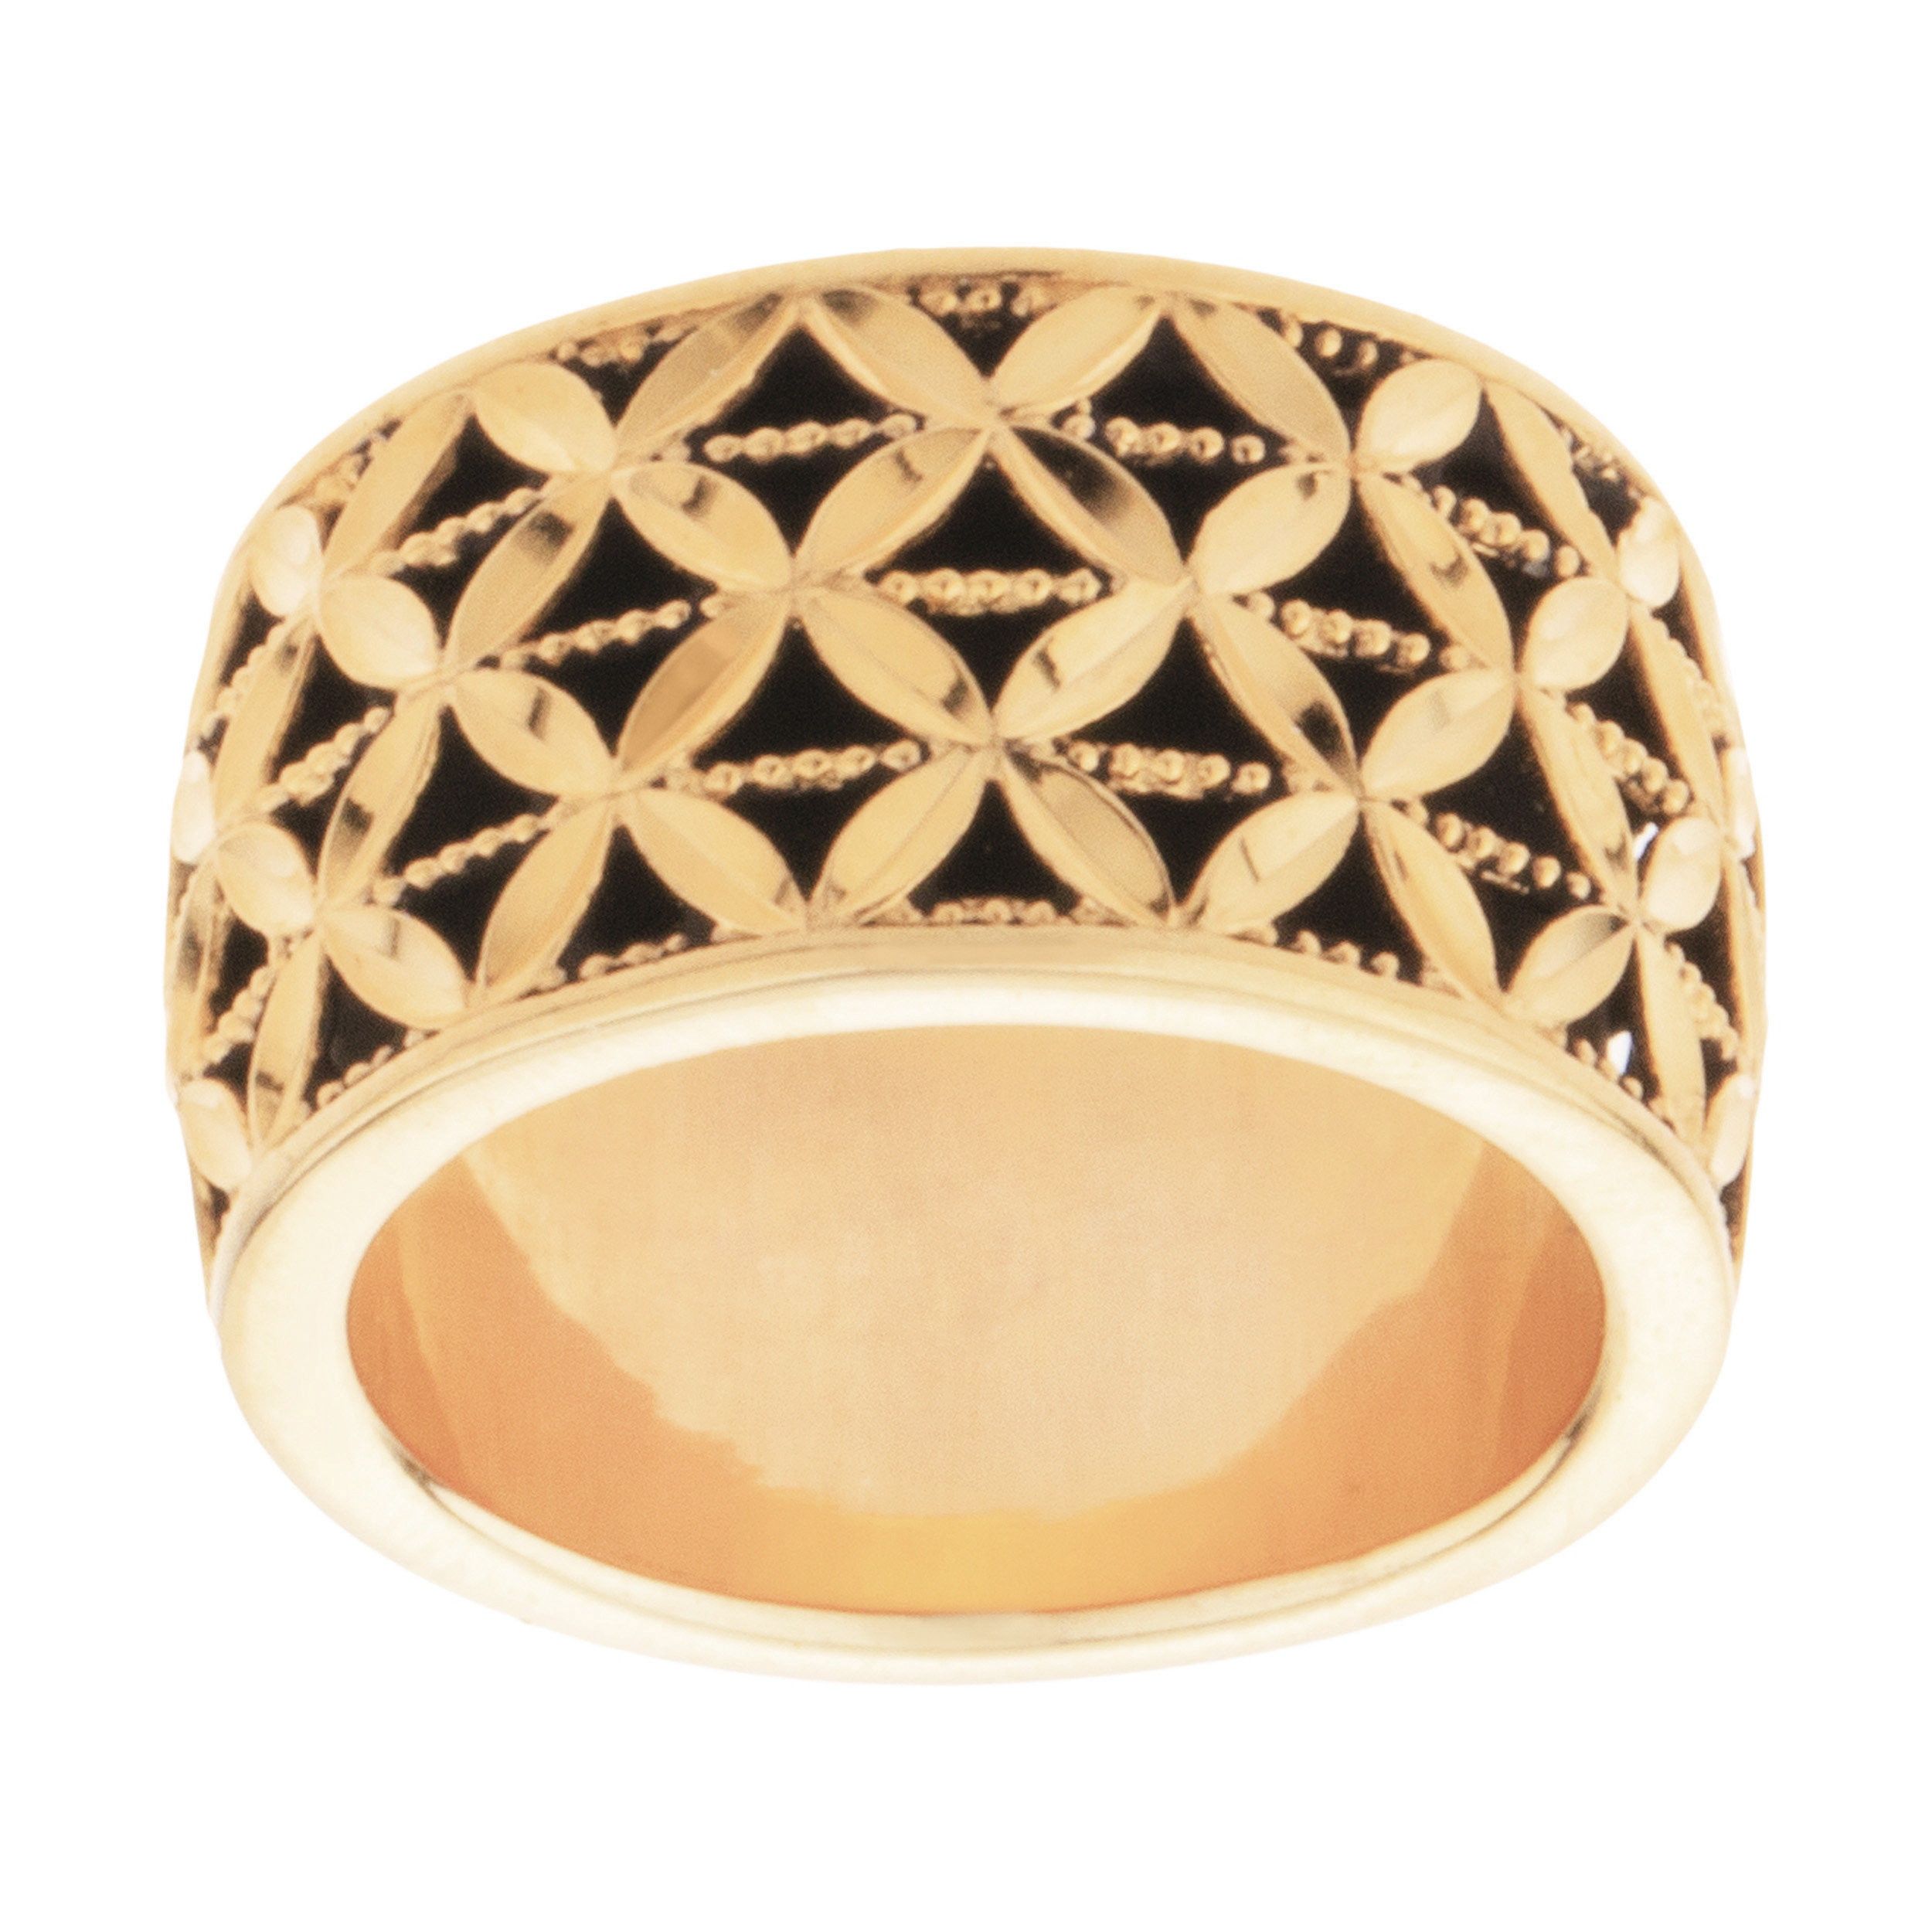 قیمت انگشتر طلا 18 عیار زنانه کد 19125